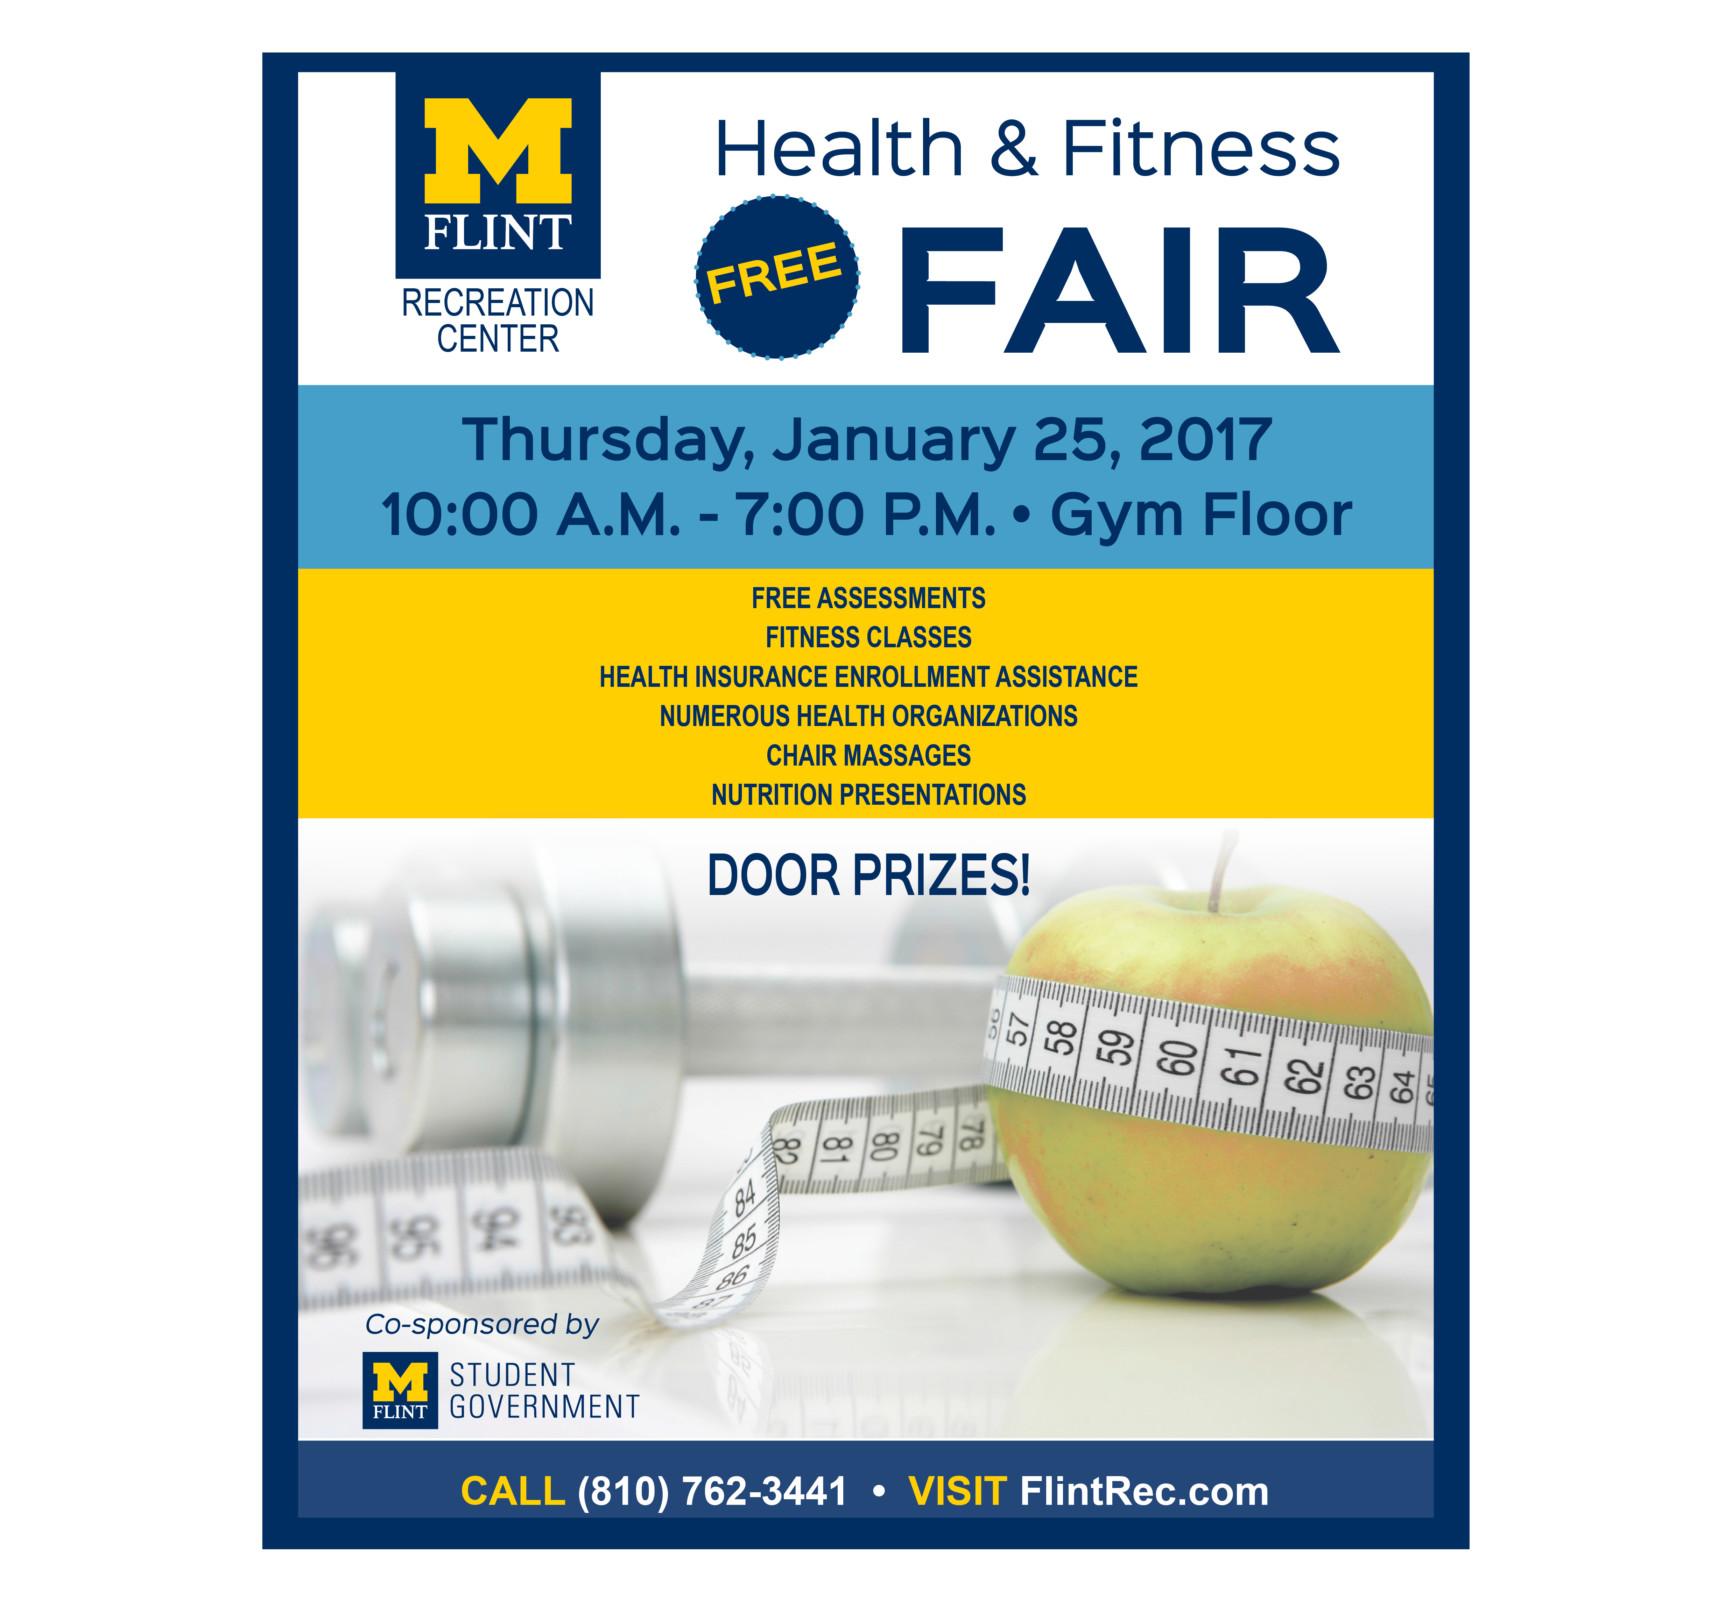 FREE fitness testing, classes, massage, etc.